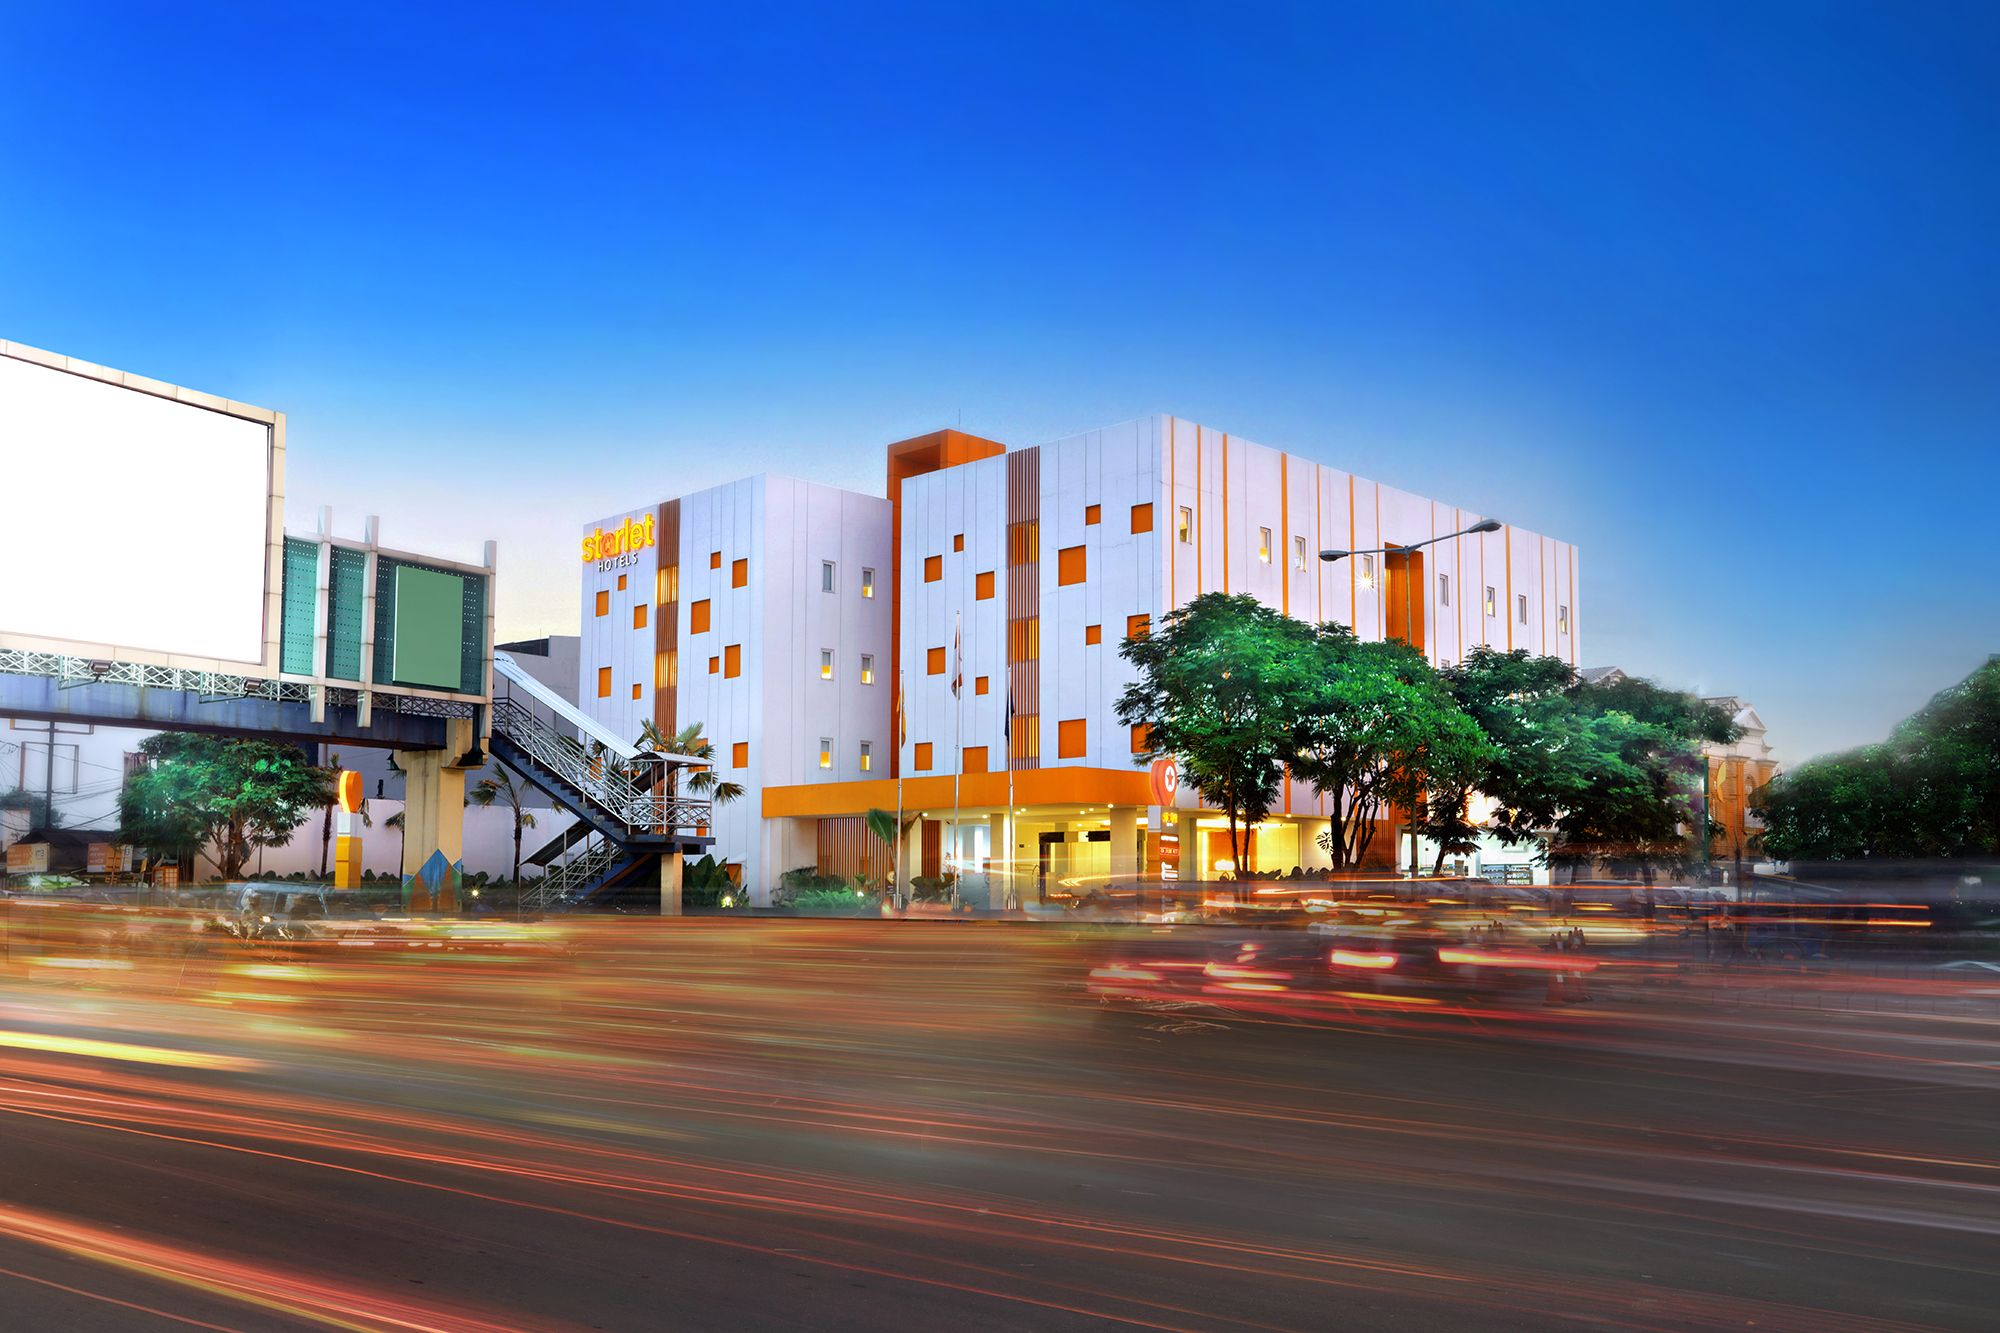 Starlet Hotel Serpong, Tangerang